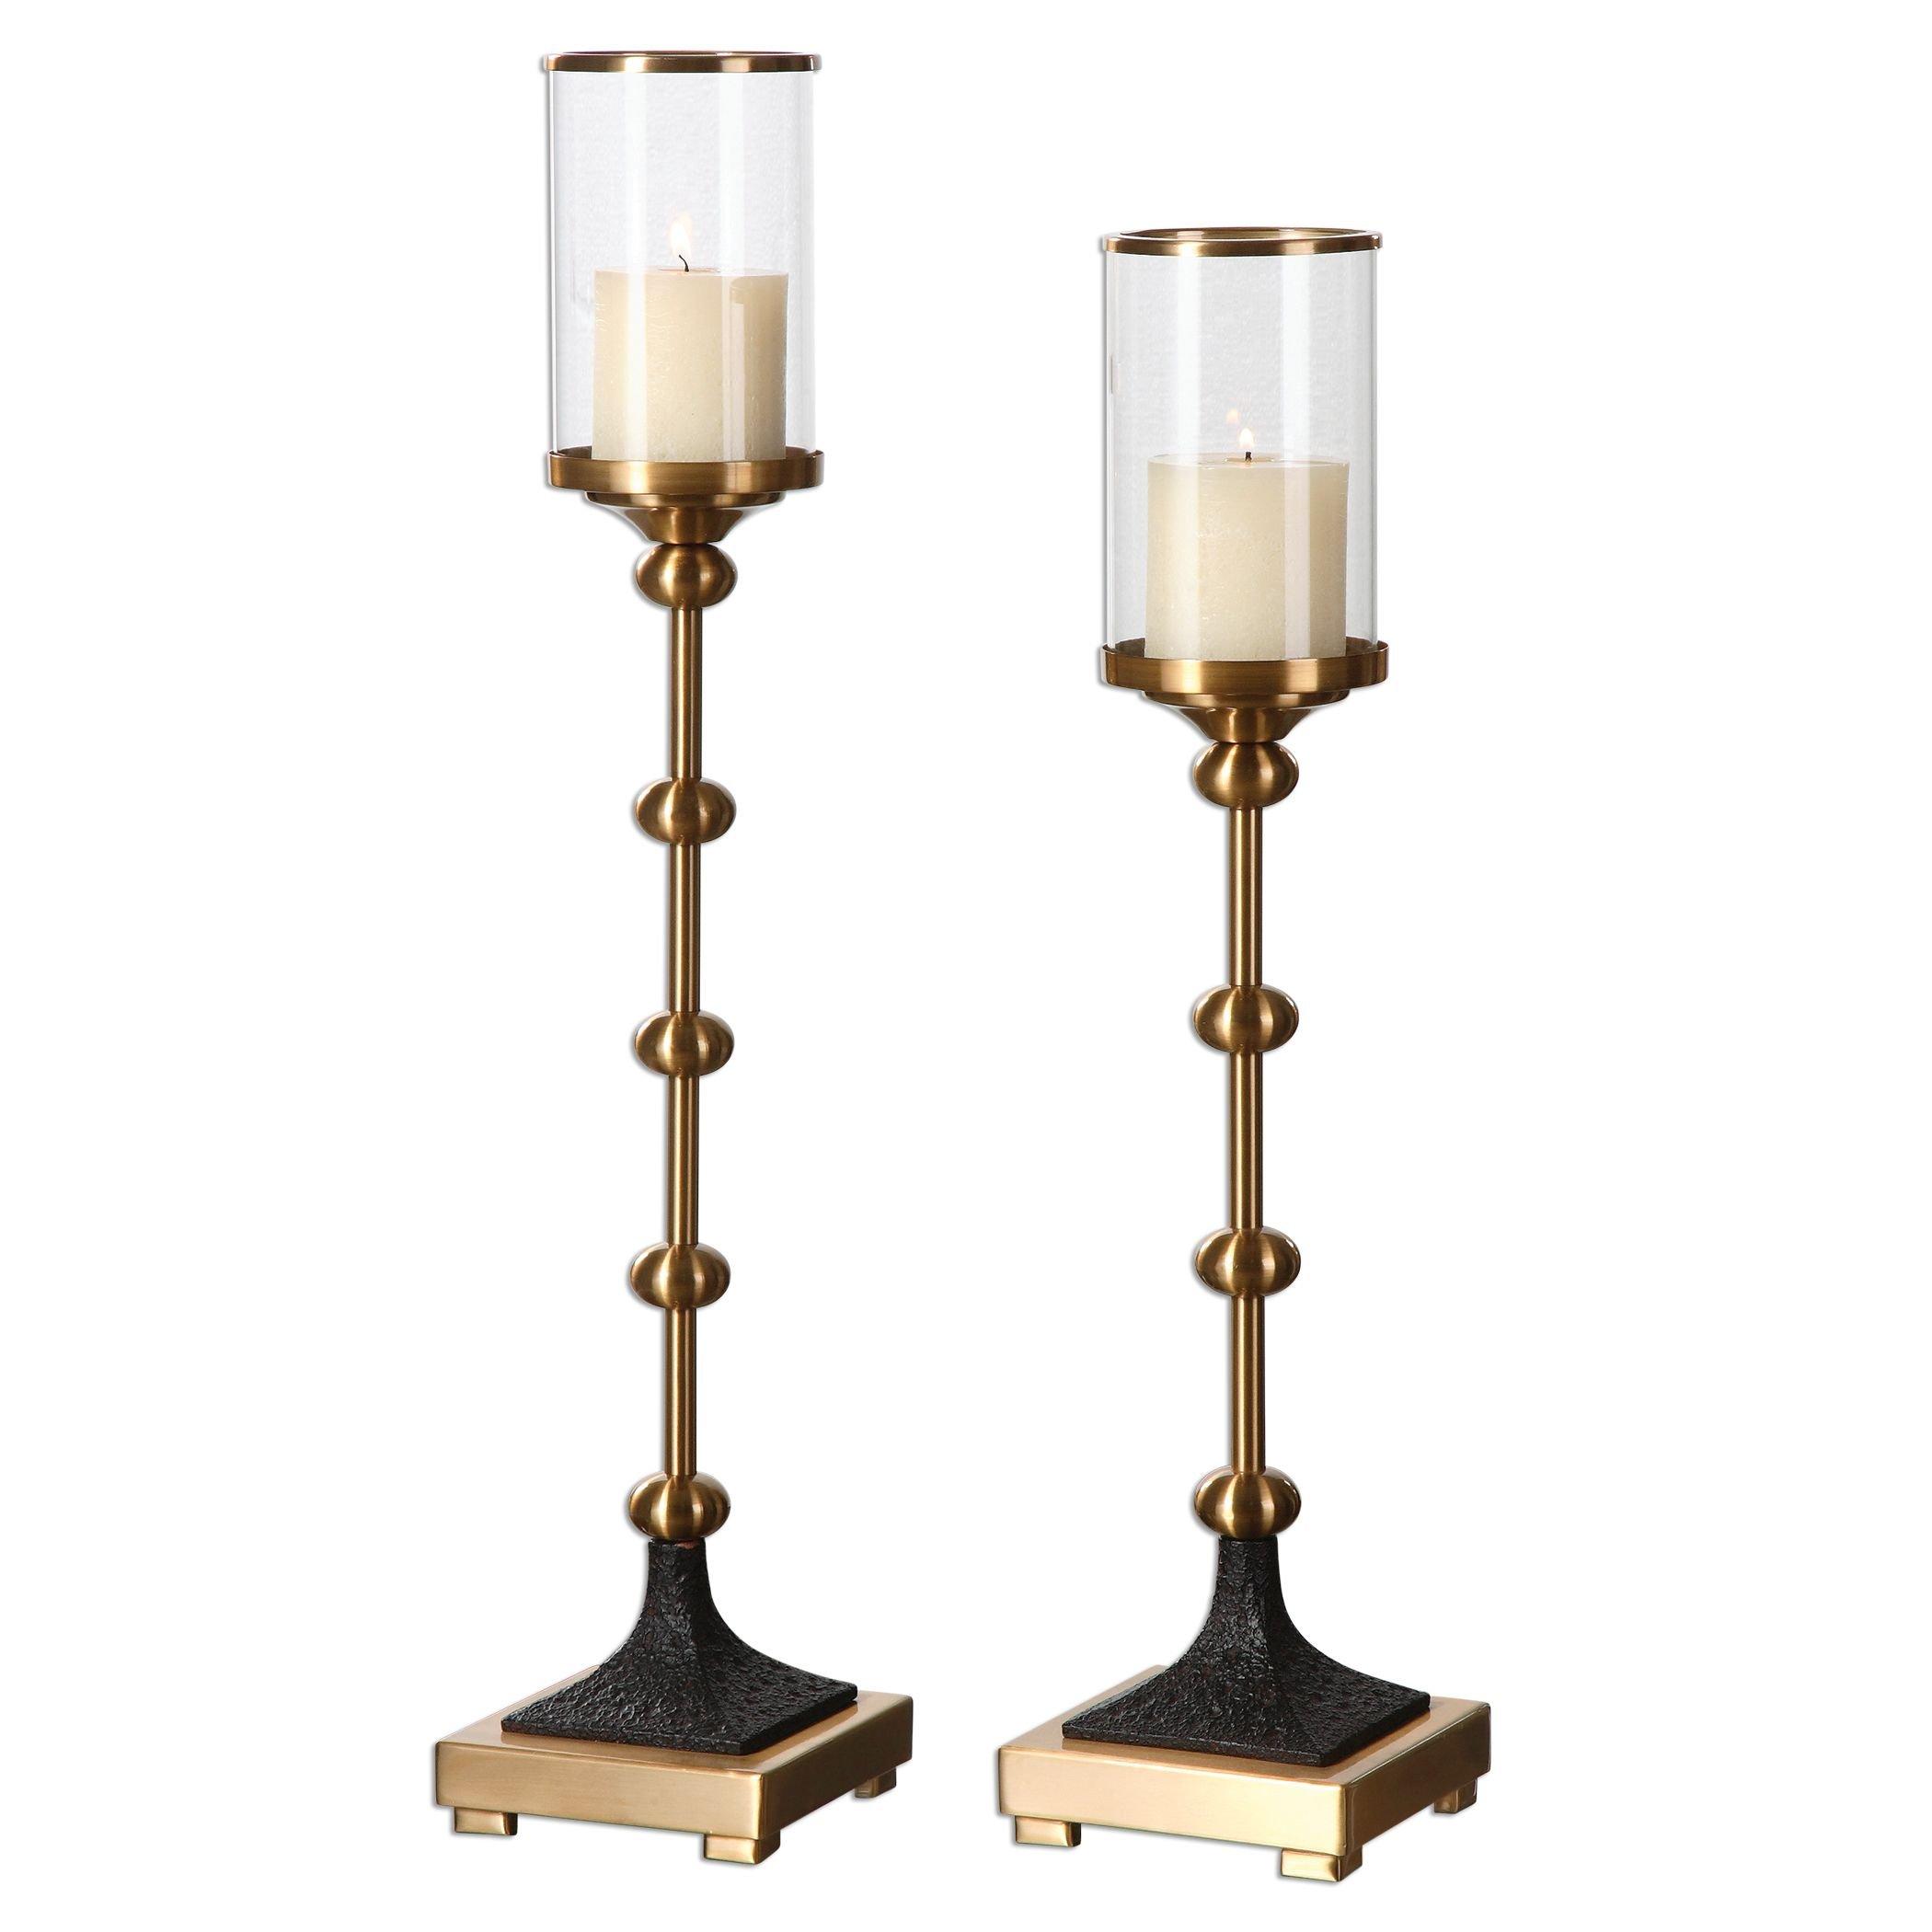 Brushed Brass Candle Holder - Set of 2